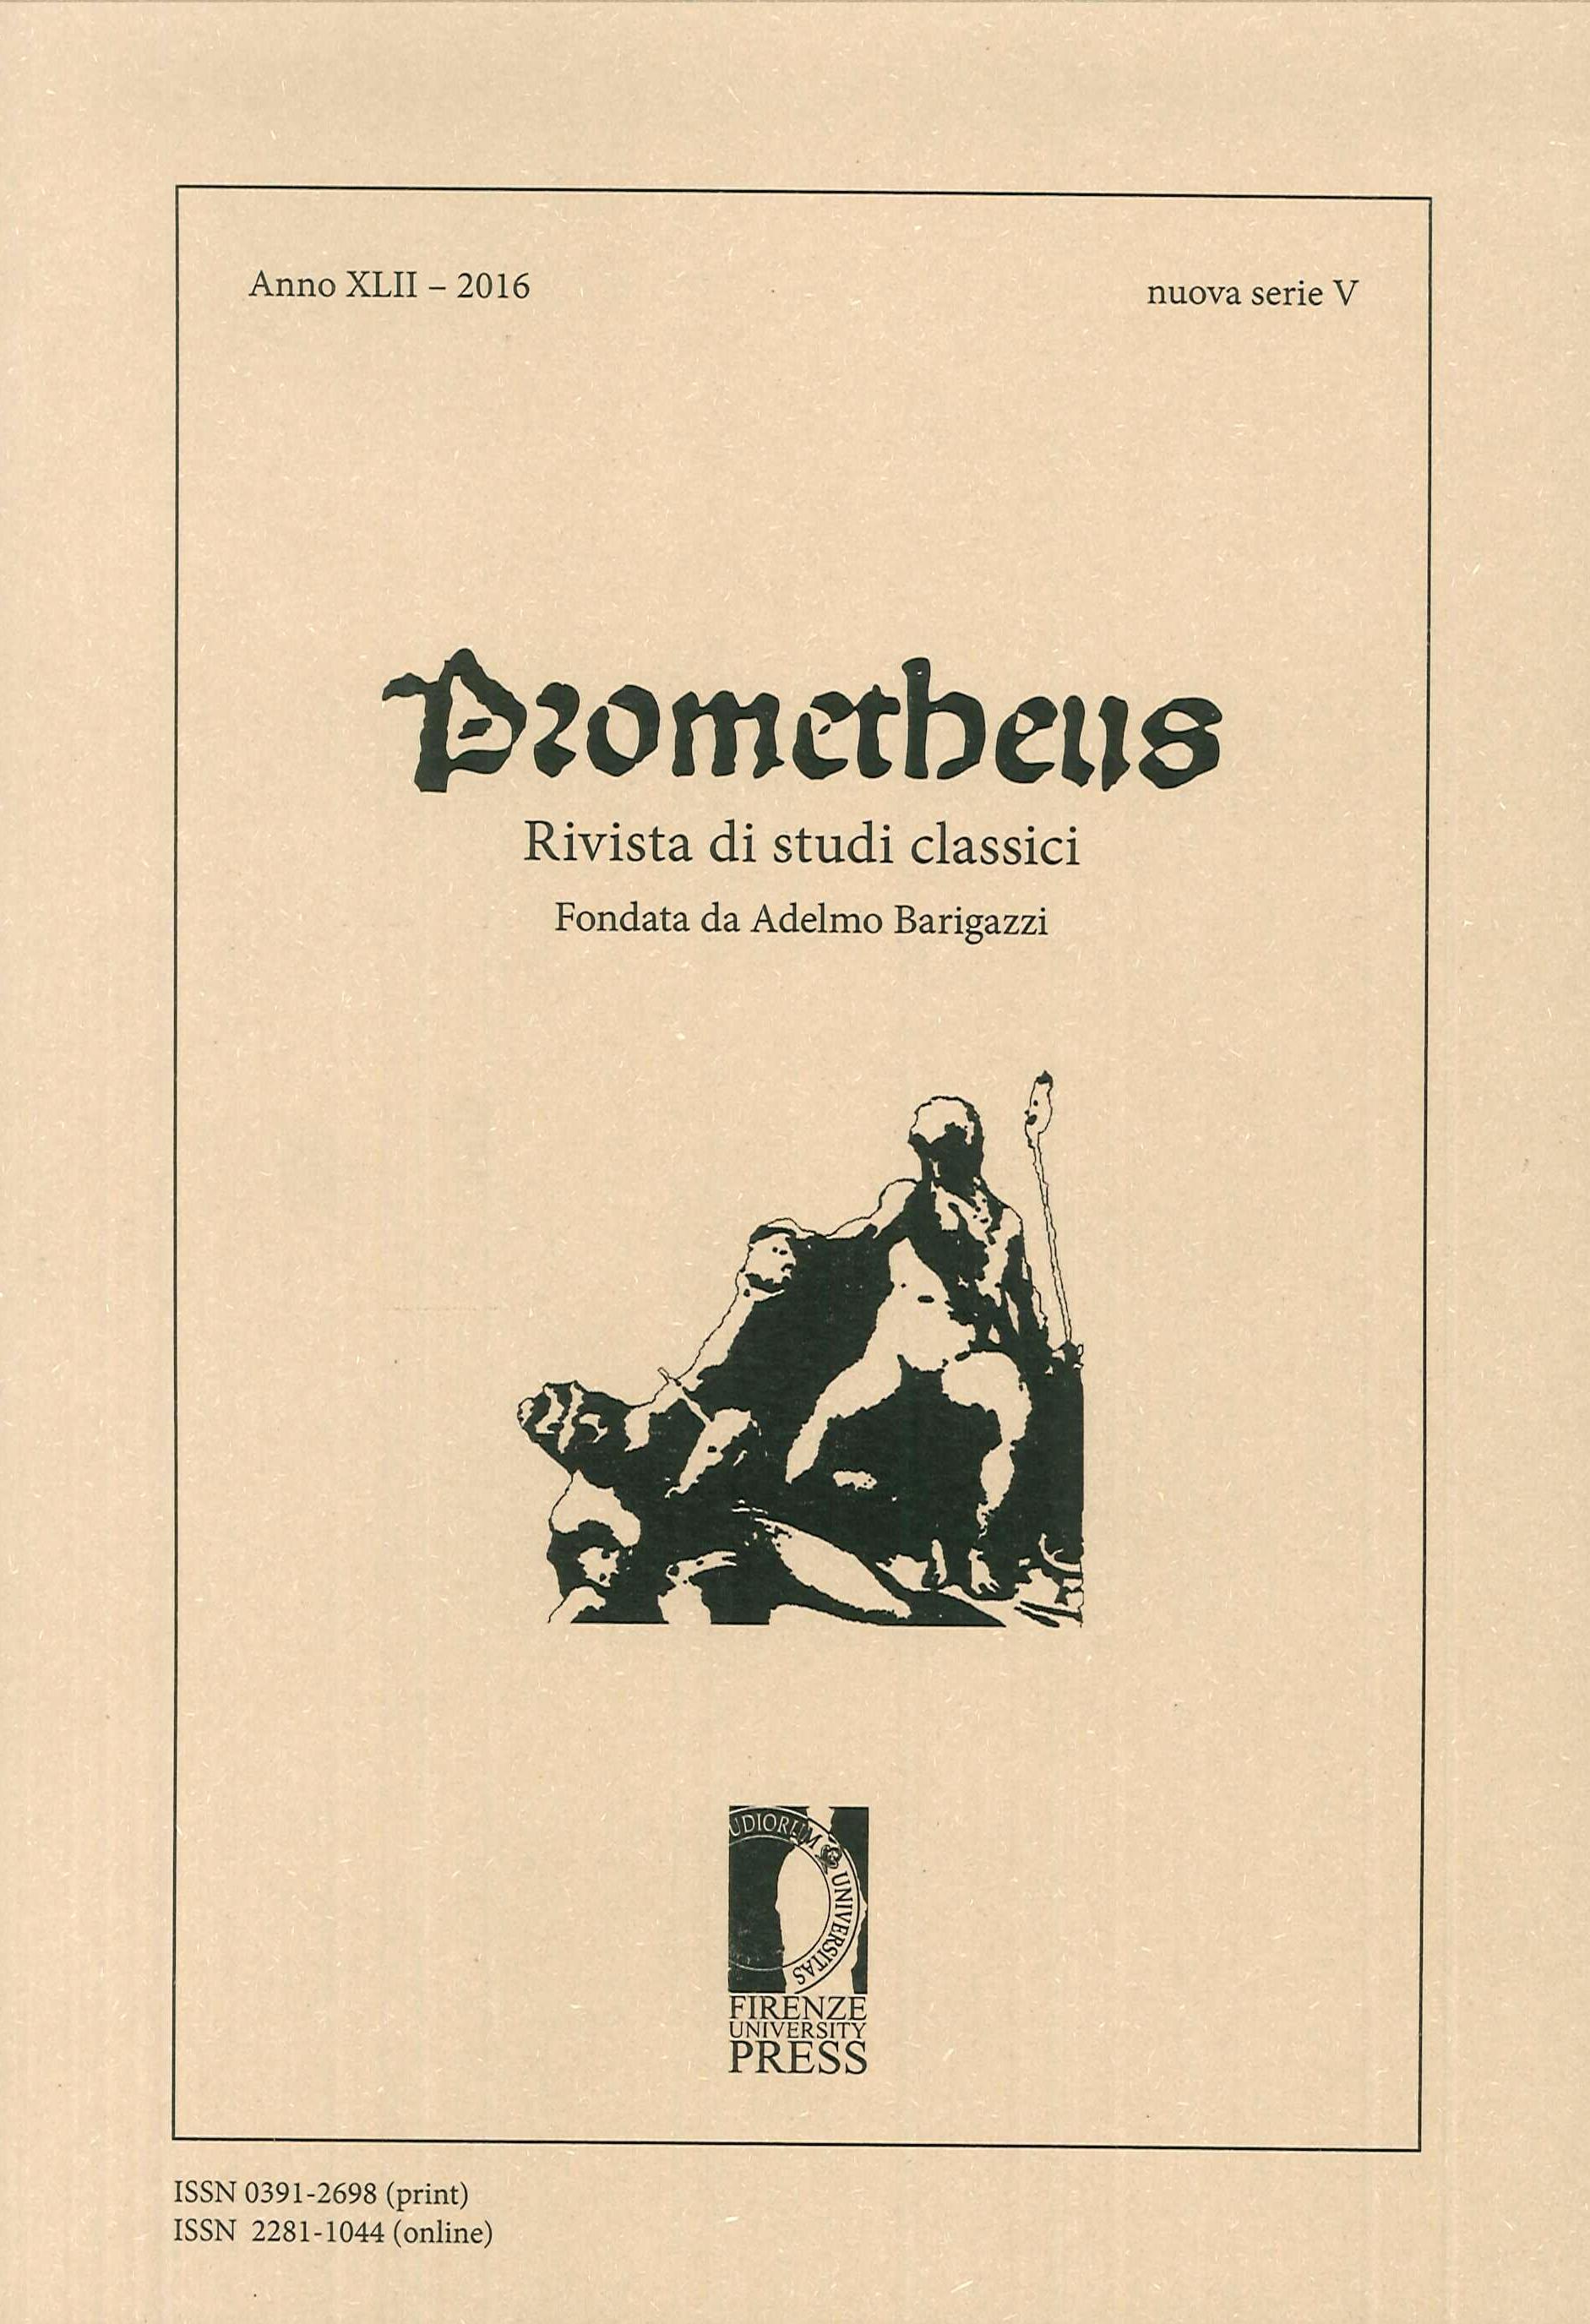 Prometheus. Rivista di studi classici. XLII - 2016